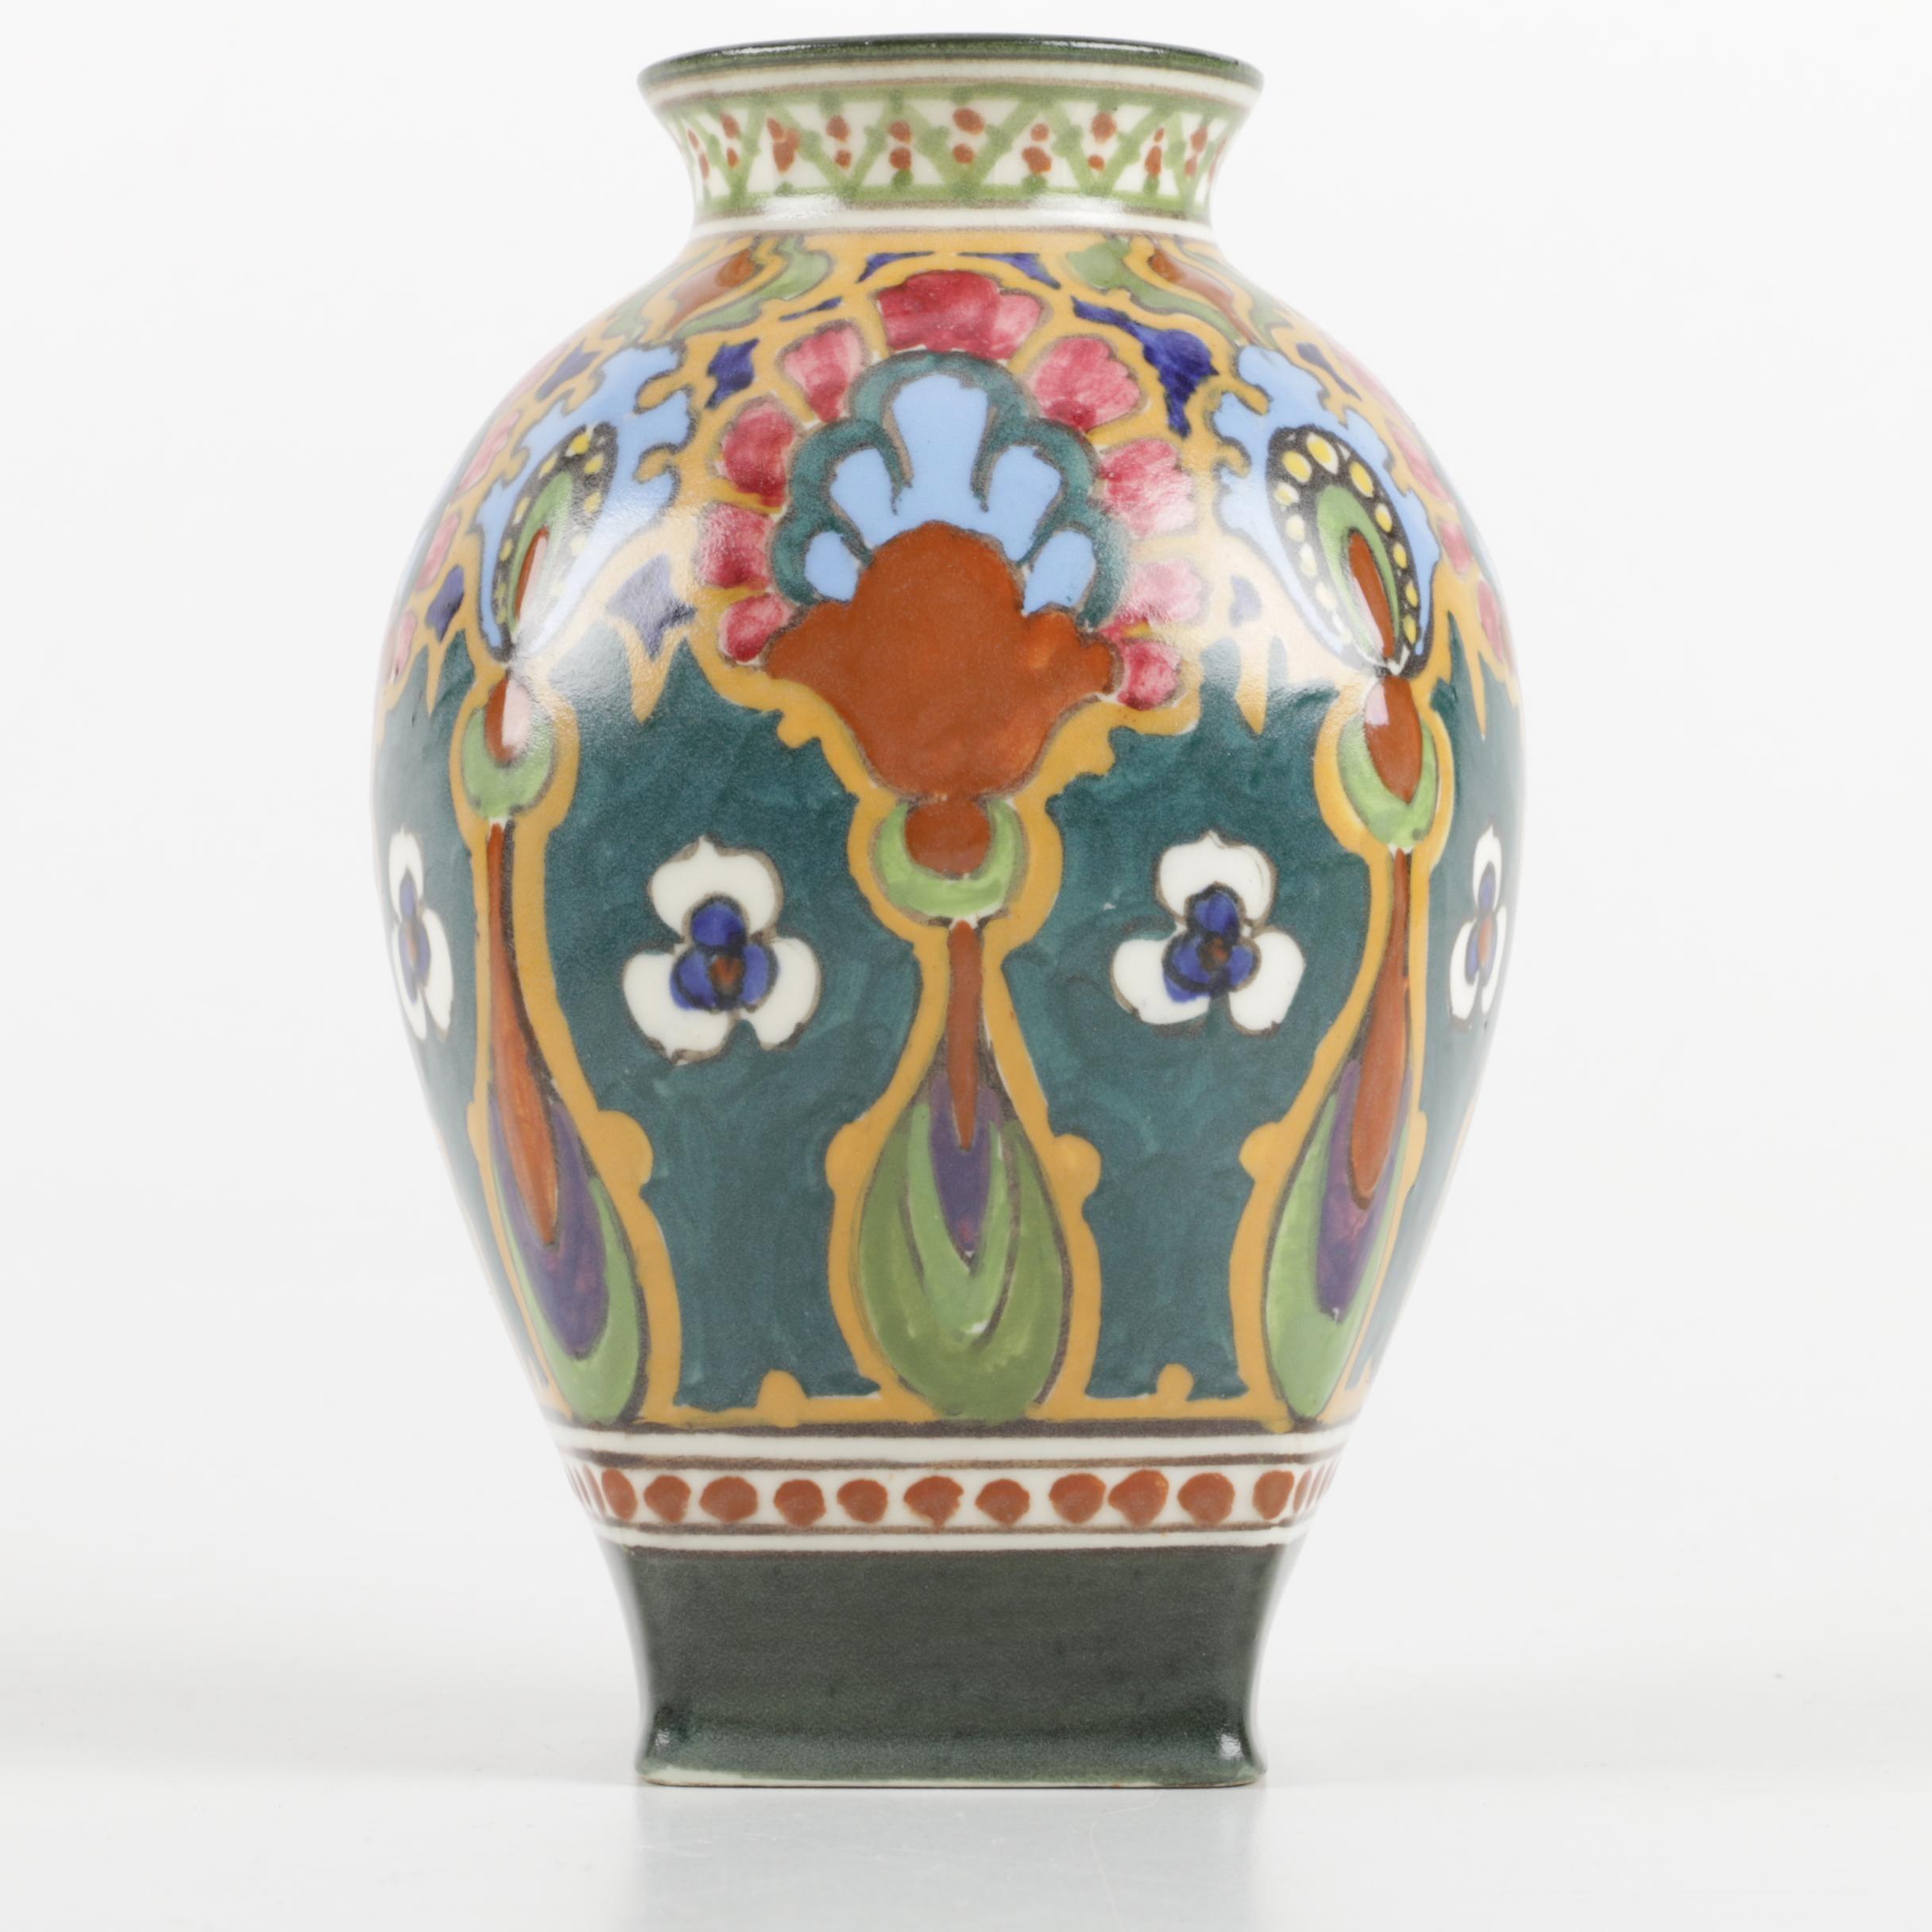 Vintage Ivora Gouda Hand-Painted Dutch Vase